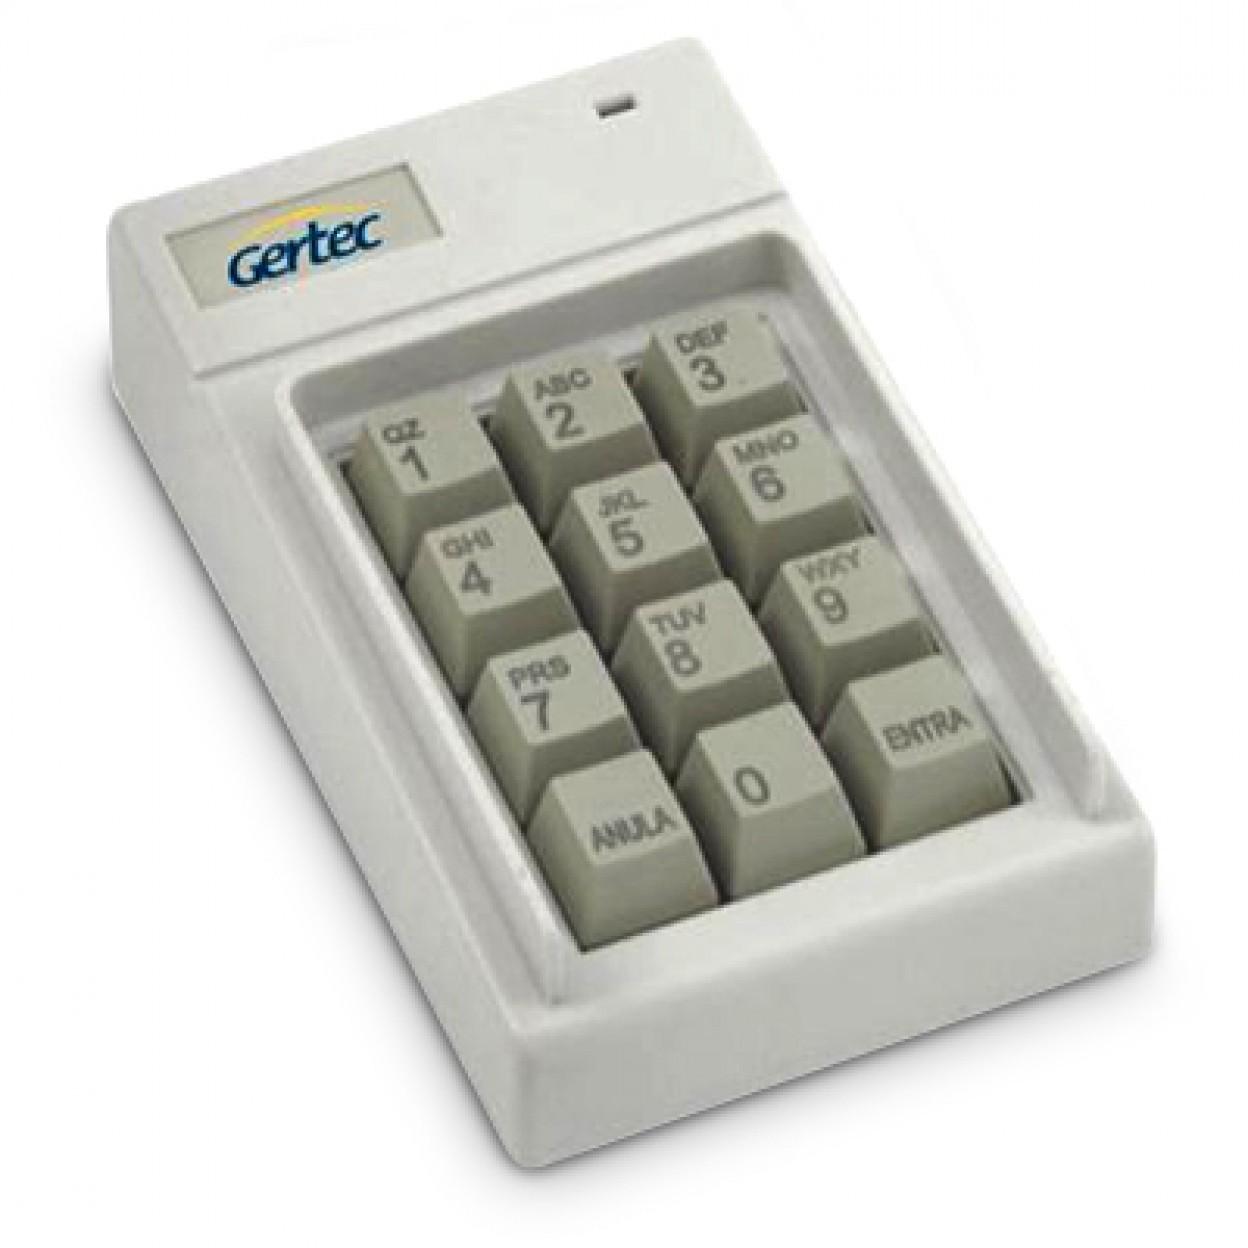 Teclado Gertec TEC 12 (PS2)